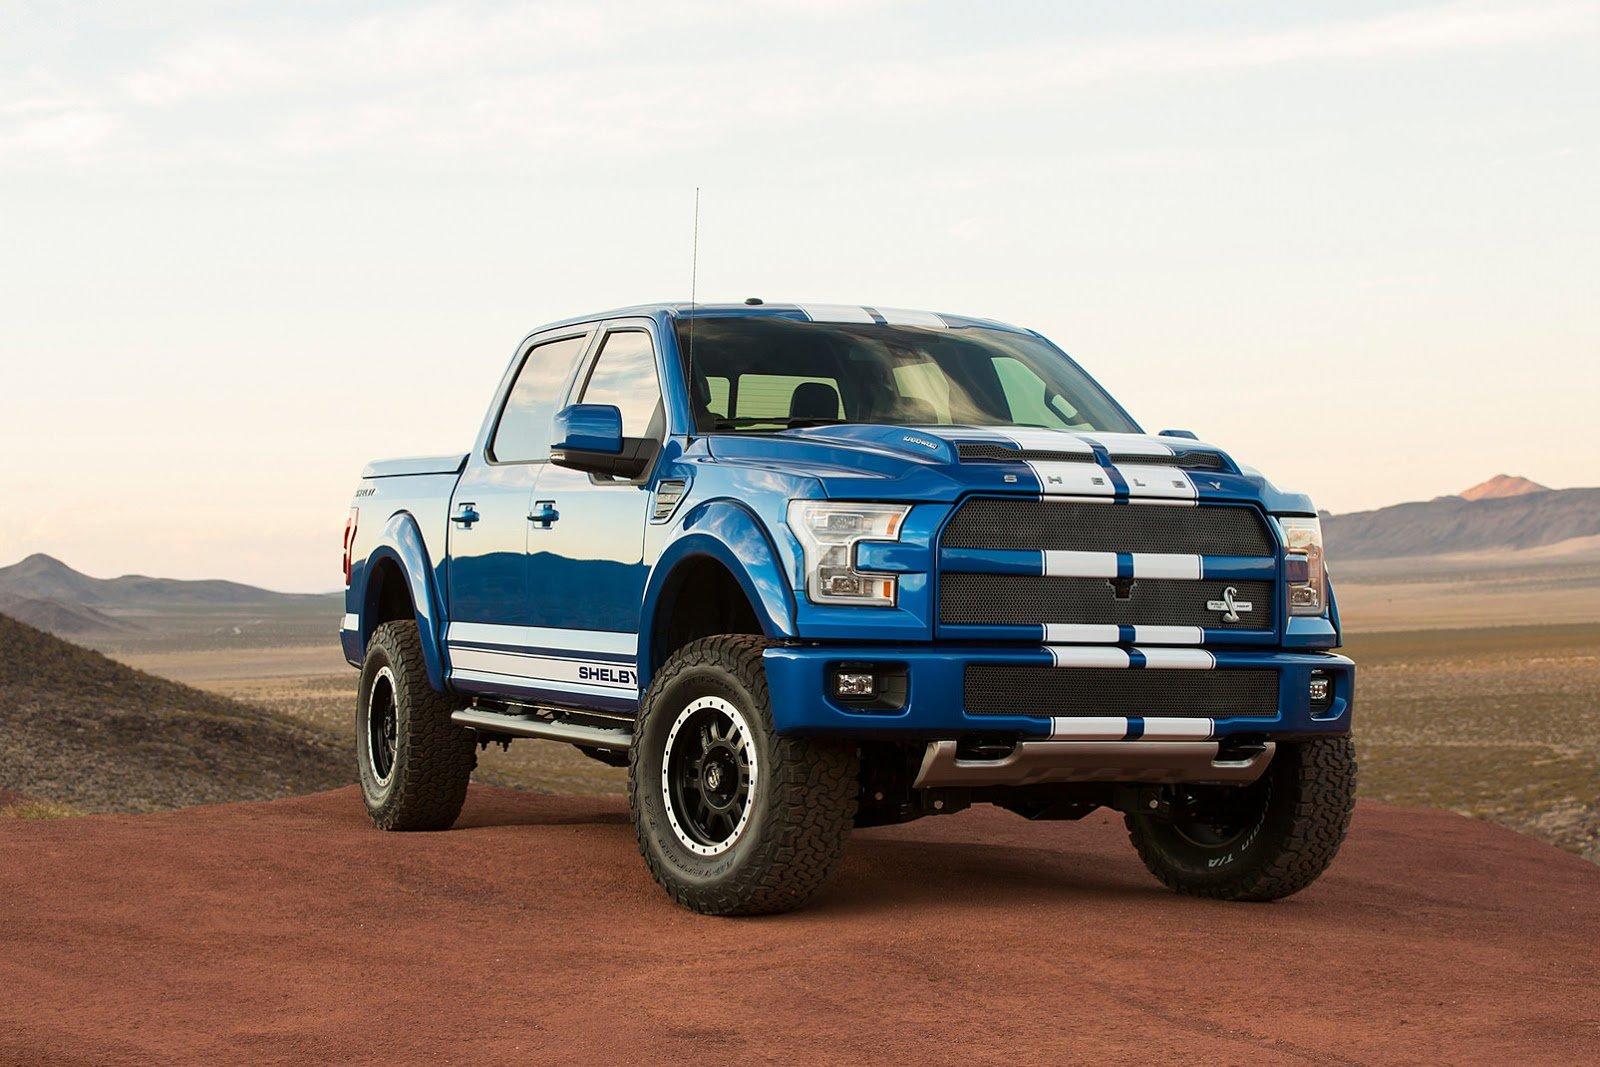 Shelby The Blue Thunder SEMA 2015 F 150 Truck Ford Pickup Wallpaper